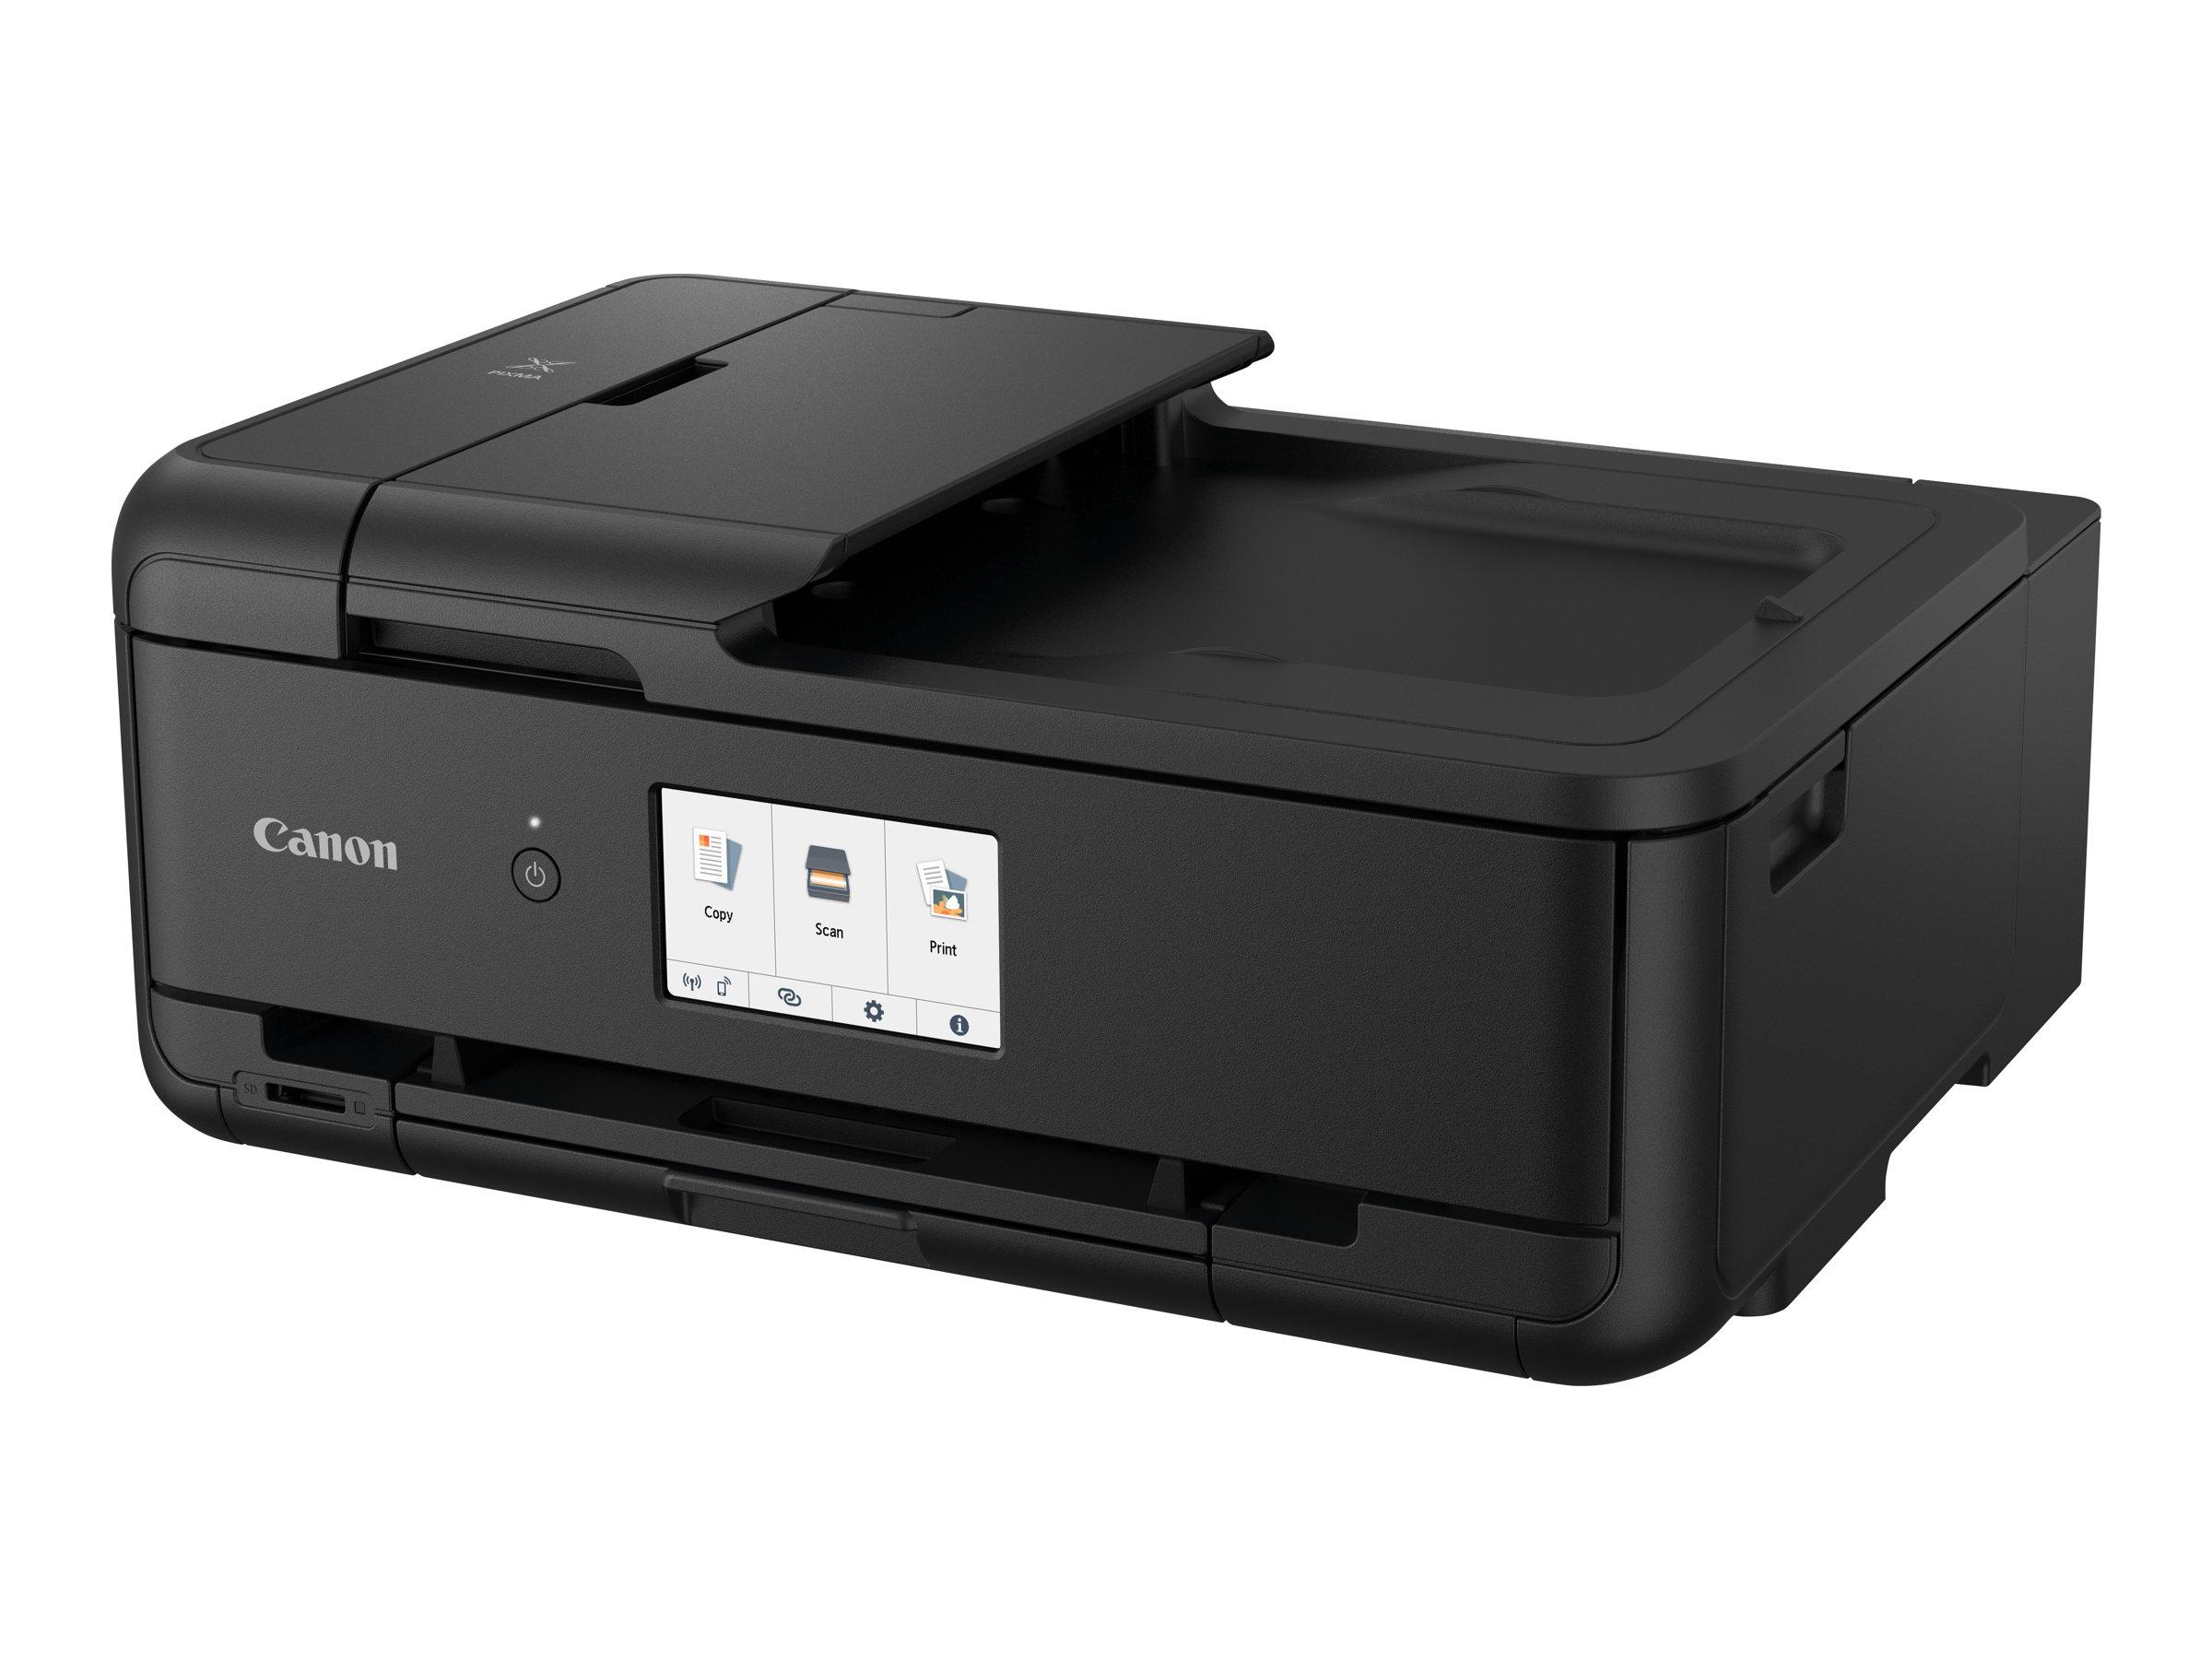 Canon PIXMA TS9550 - Multifunktionsdrucker - Farbe - Tintenstrahl - 216 x 356 mm (Original)